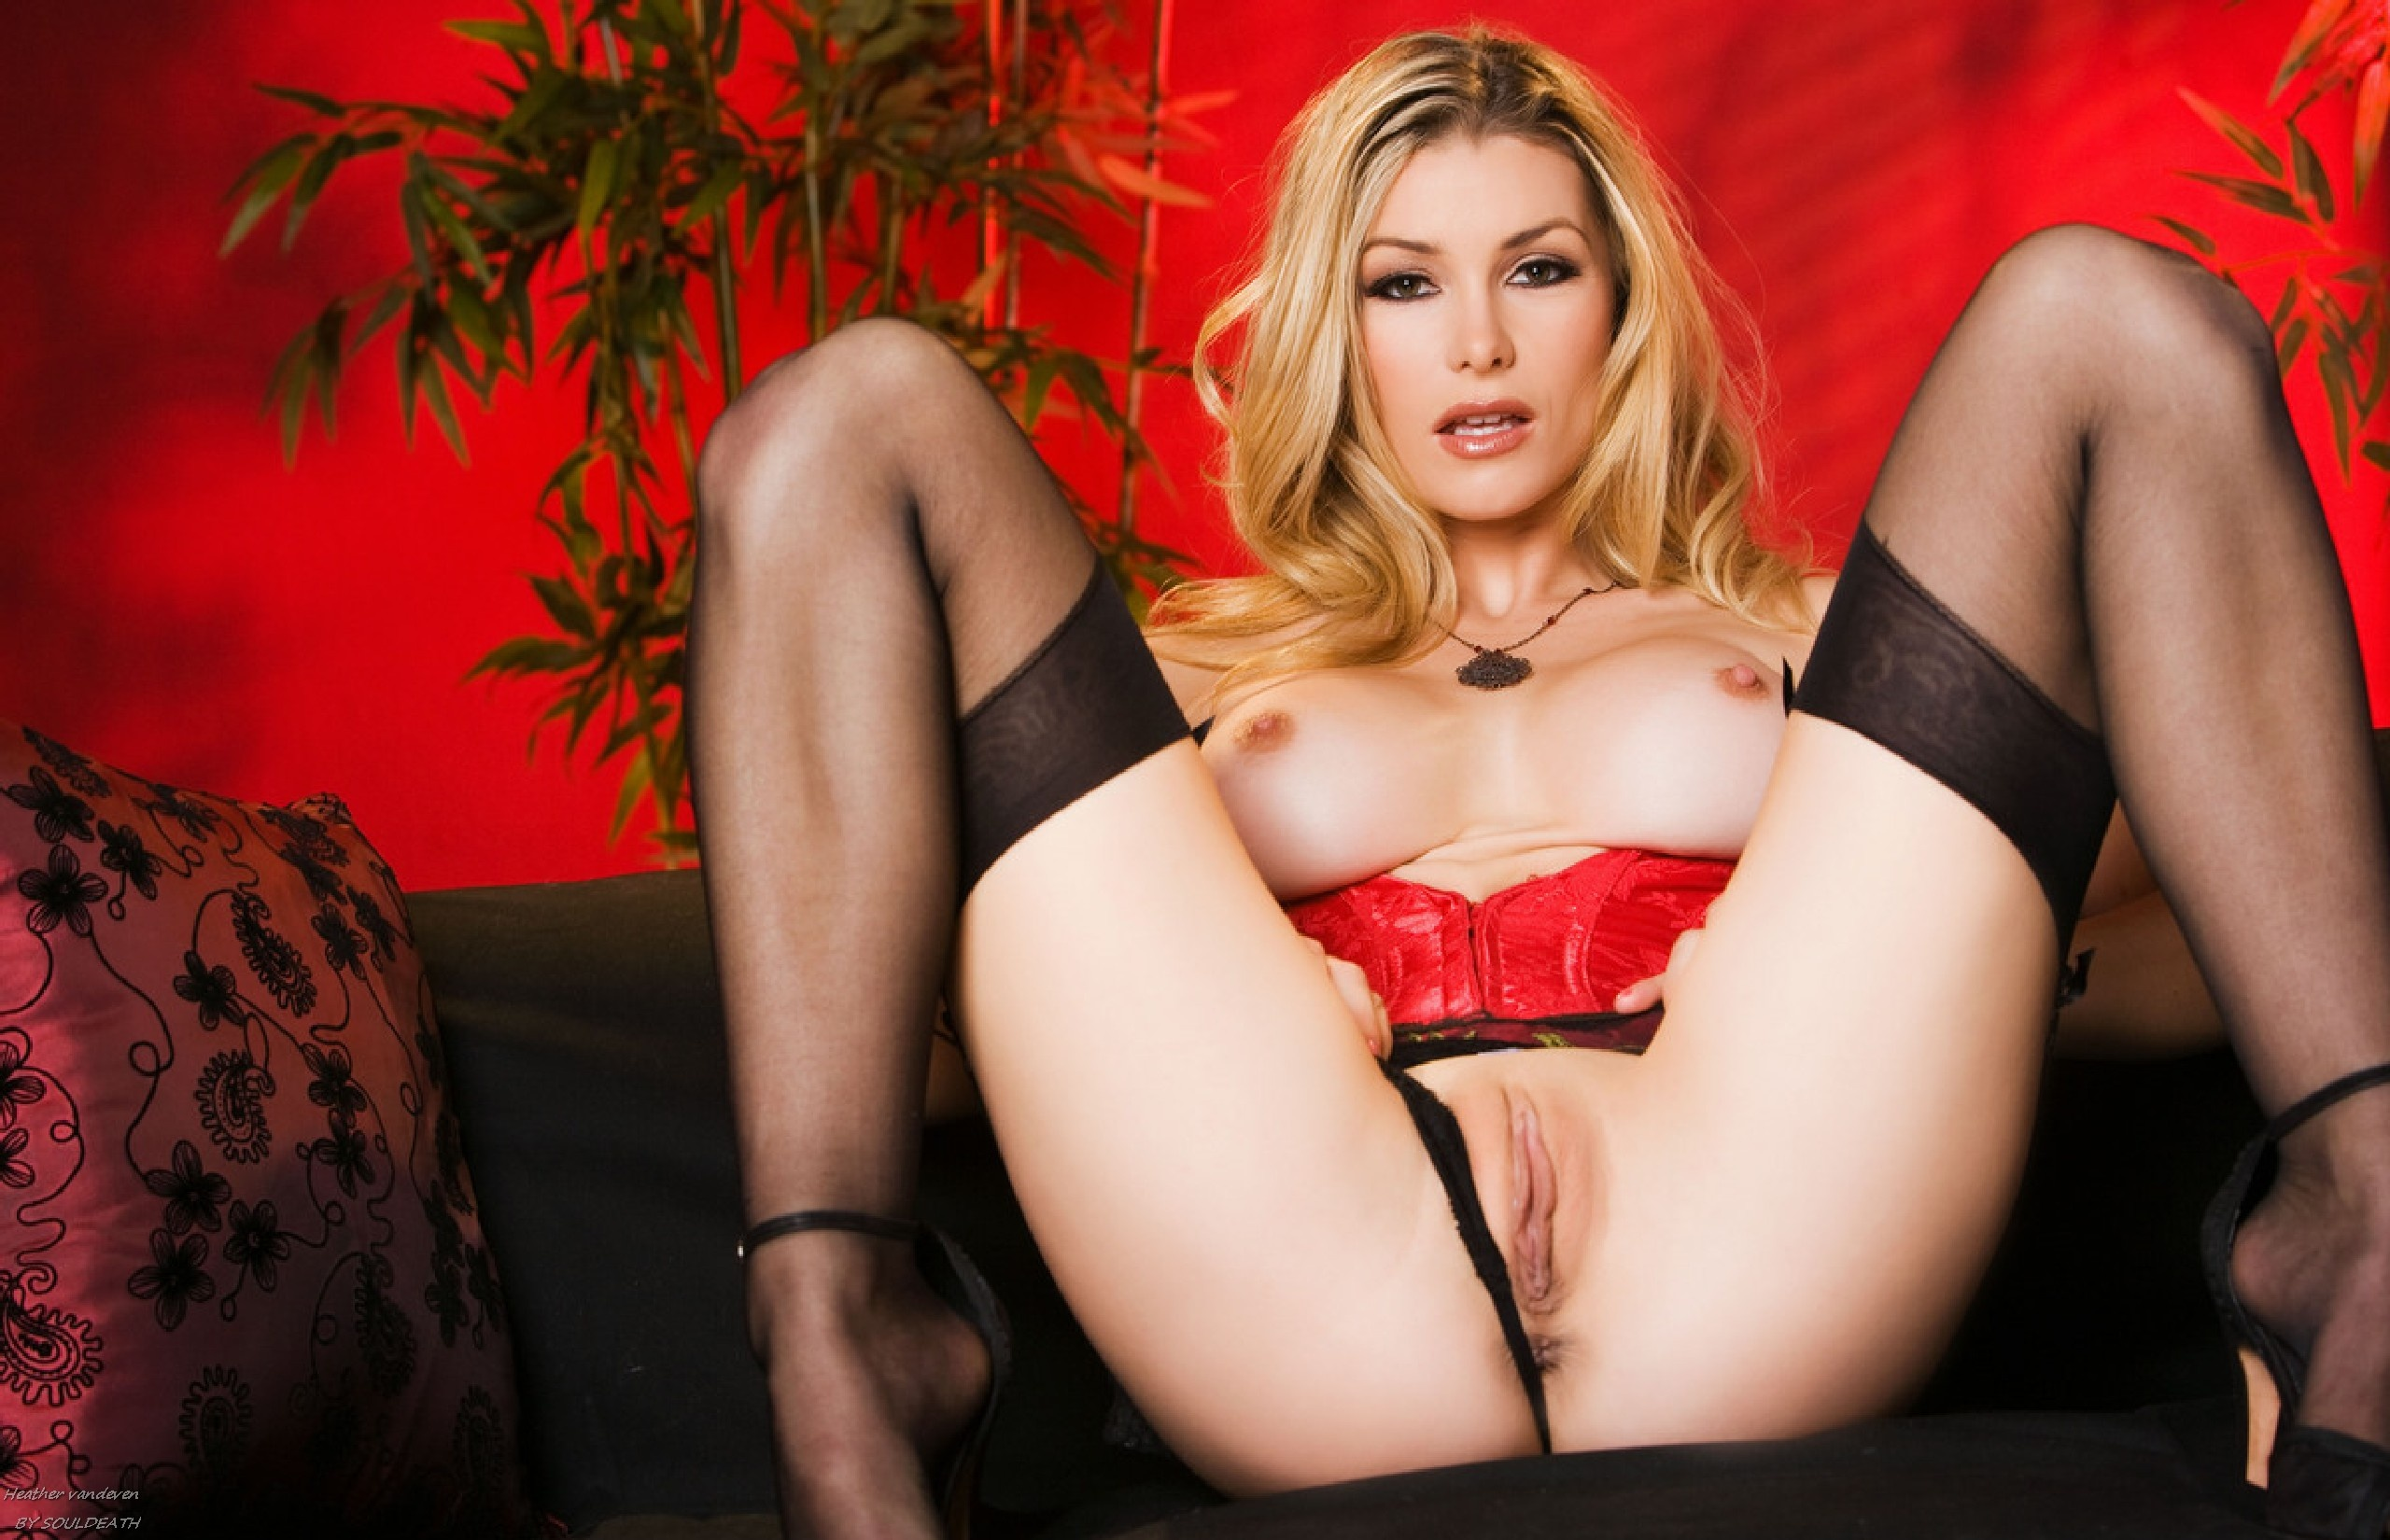 pussy legs ass spread Blonde